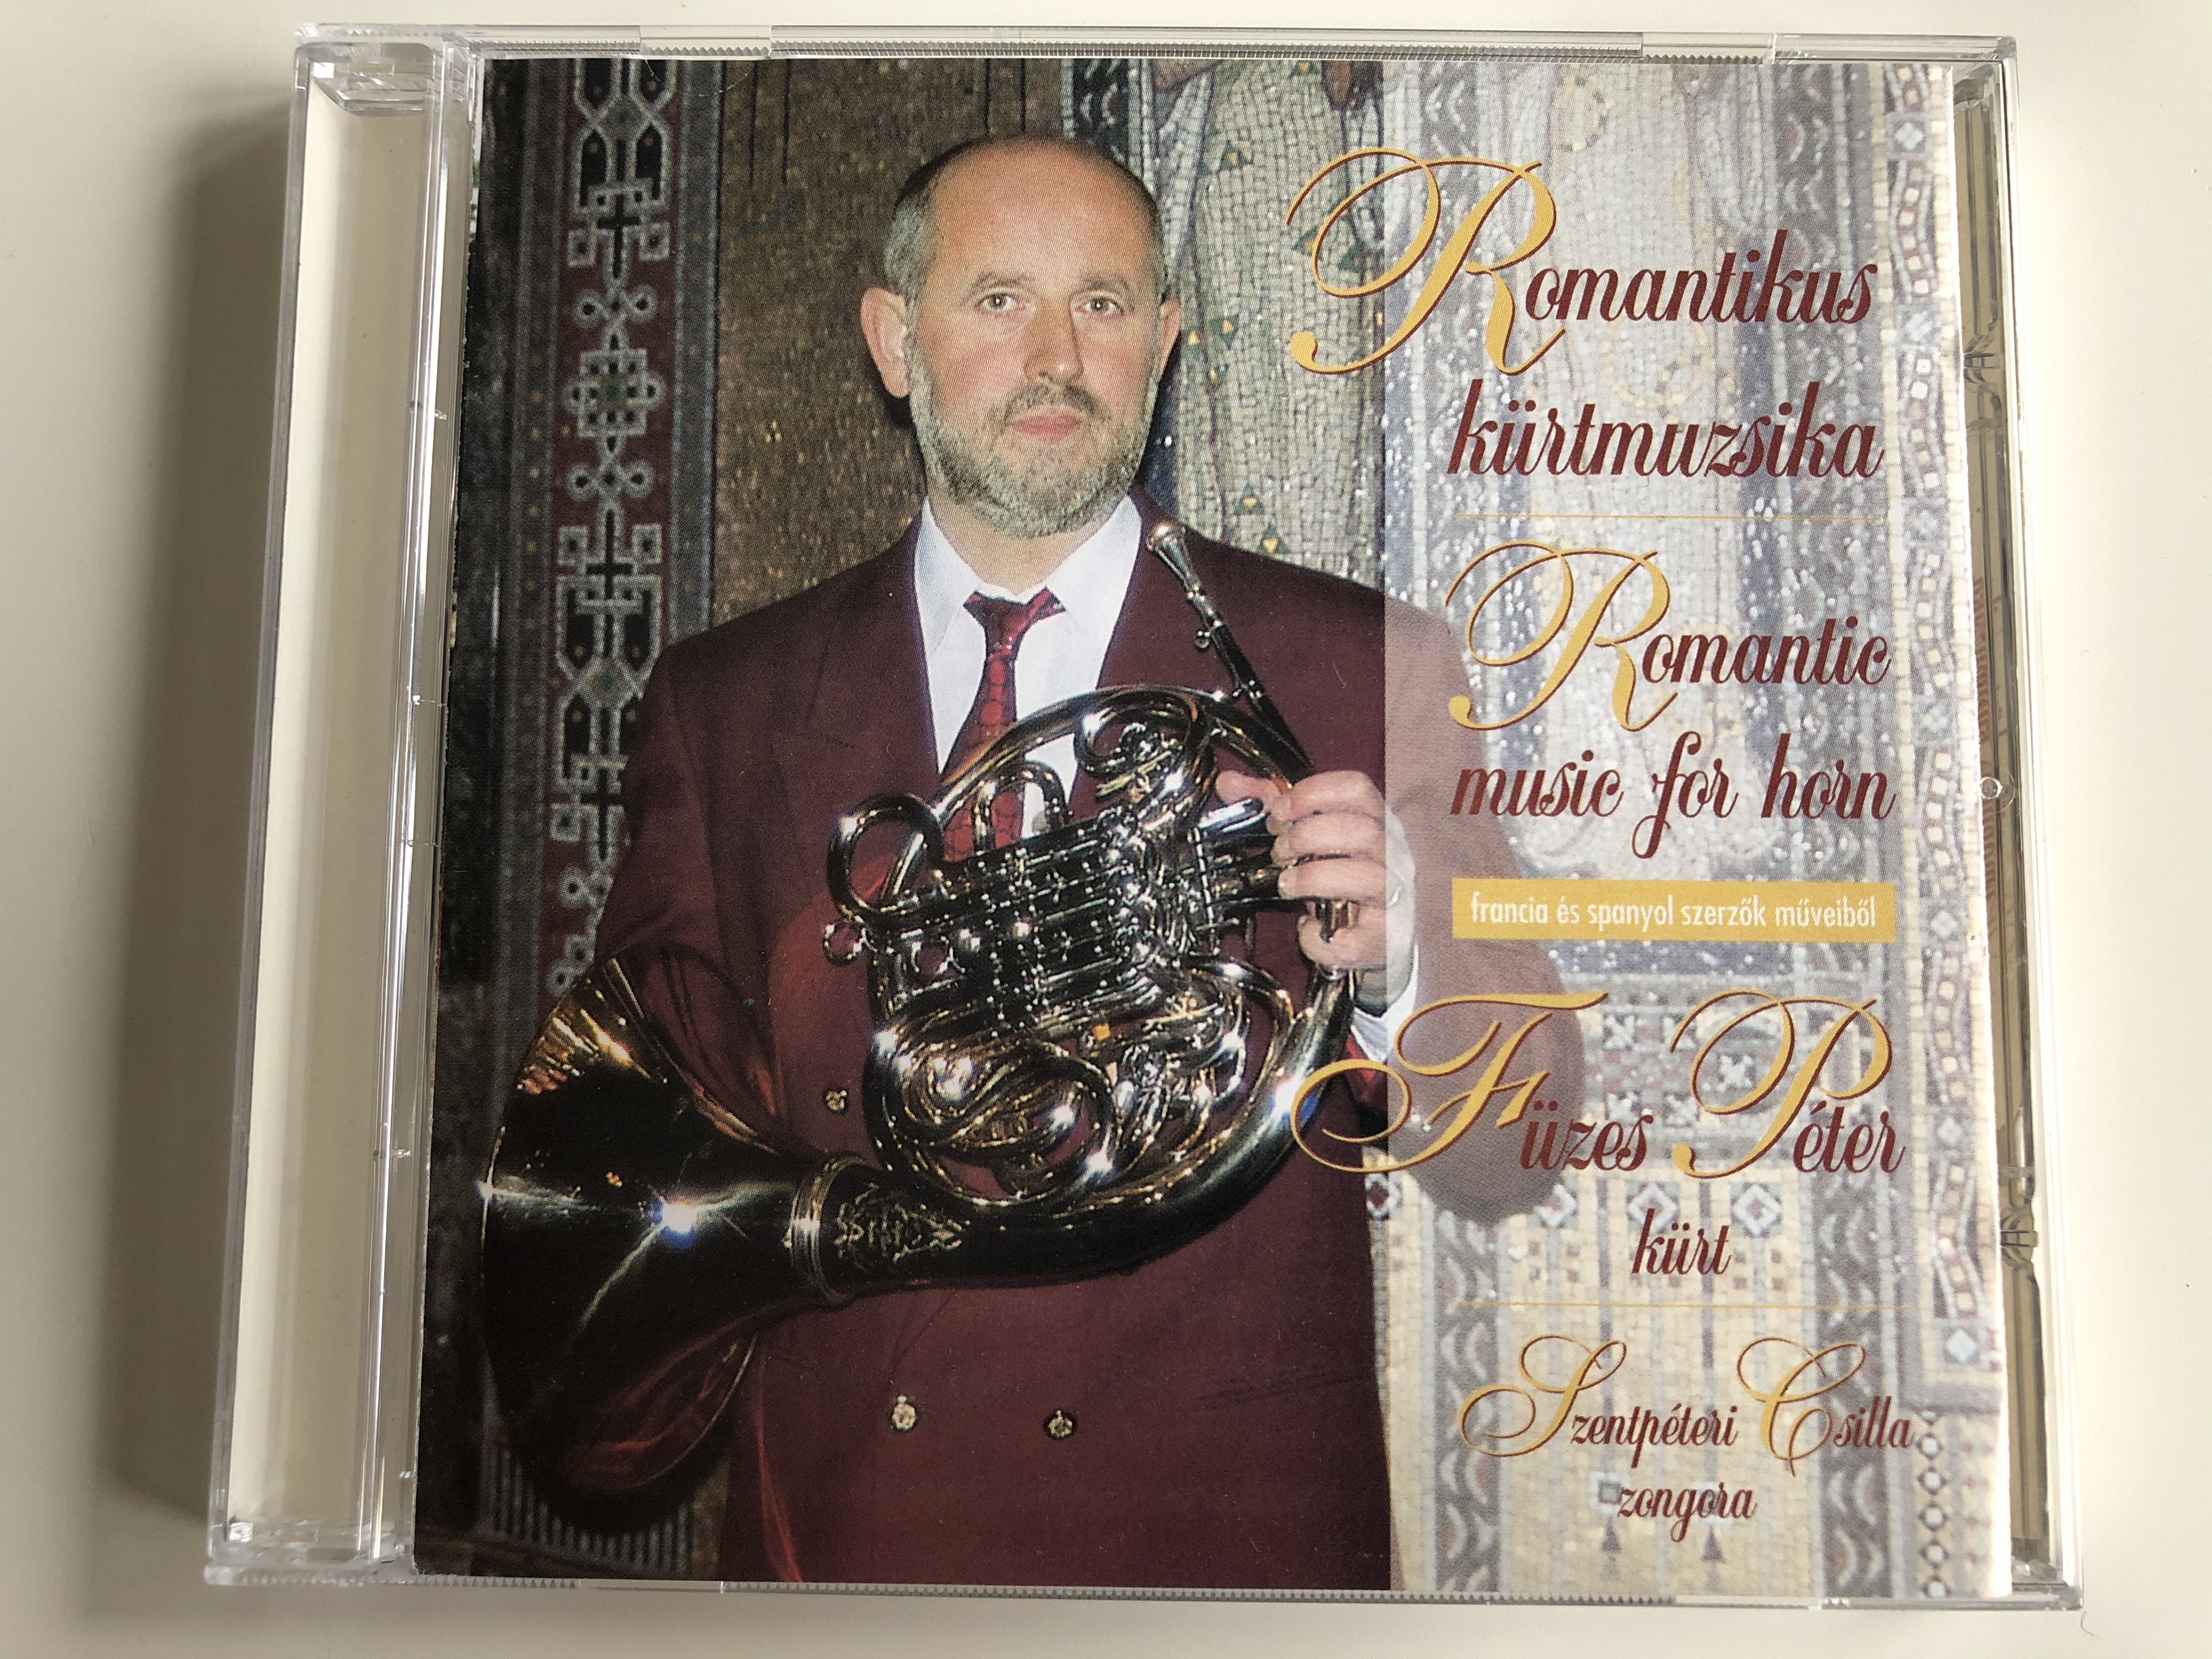 romantikus-k-rtmuzsika-romantic-music-for-horn-f-zes-p-ter-kurt-szentpetei-csilla-zongora-audio-cd-fp-001-1-.jpg